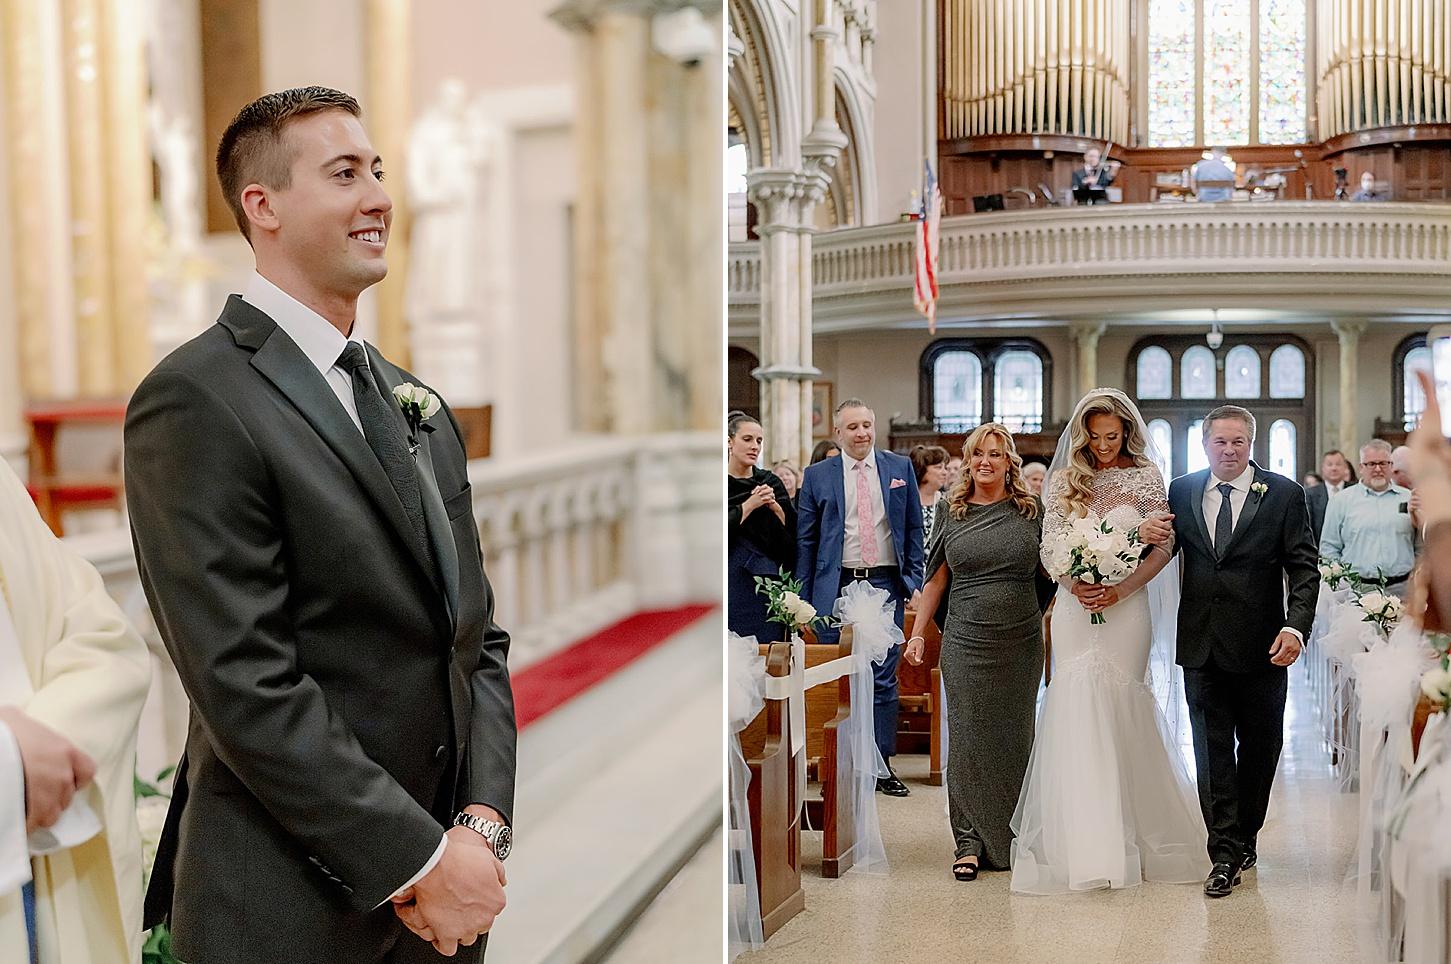 Atlantic City Wedding Photography Studio by Magdalena Studios Lexy Cha 0020